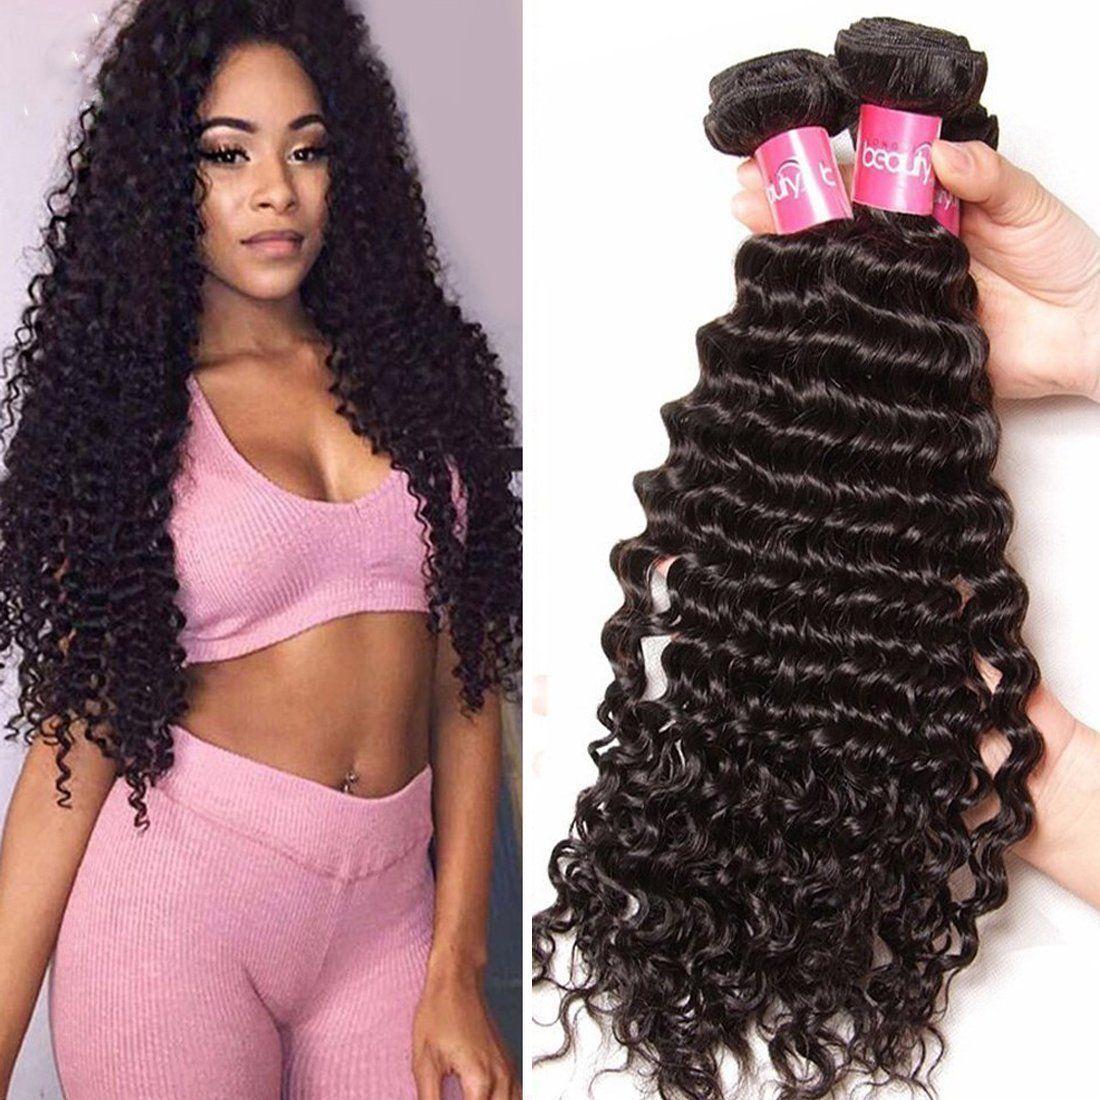 Sunber Hair Remy Brazilian Hair Deep Wave Virgin Human Hair